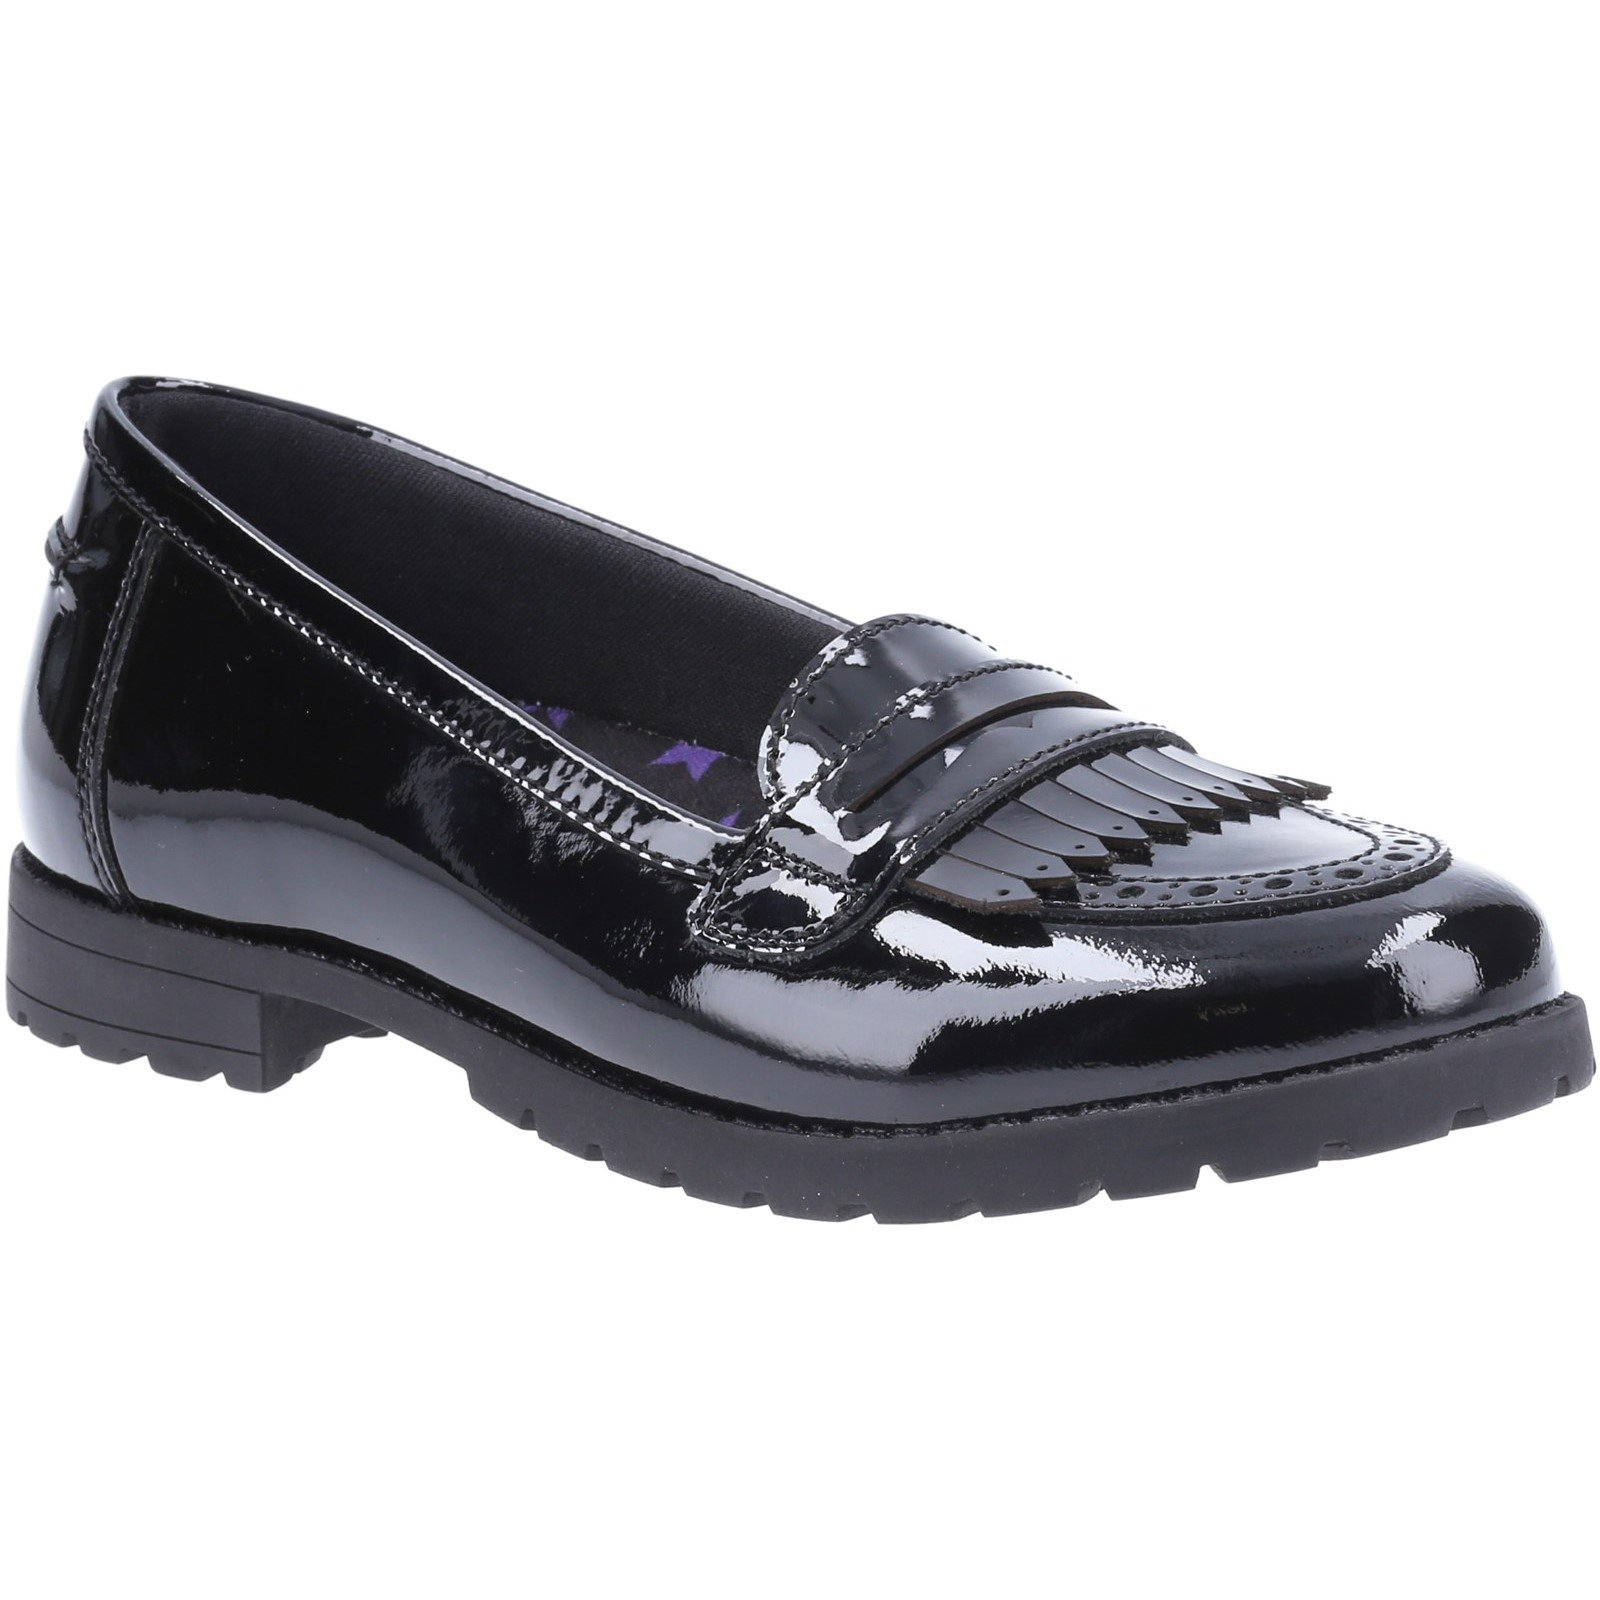 Hush Puppies Kid's Emer Junior School Shoe Patent Black 32595 - Patent Black 1